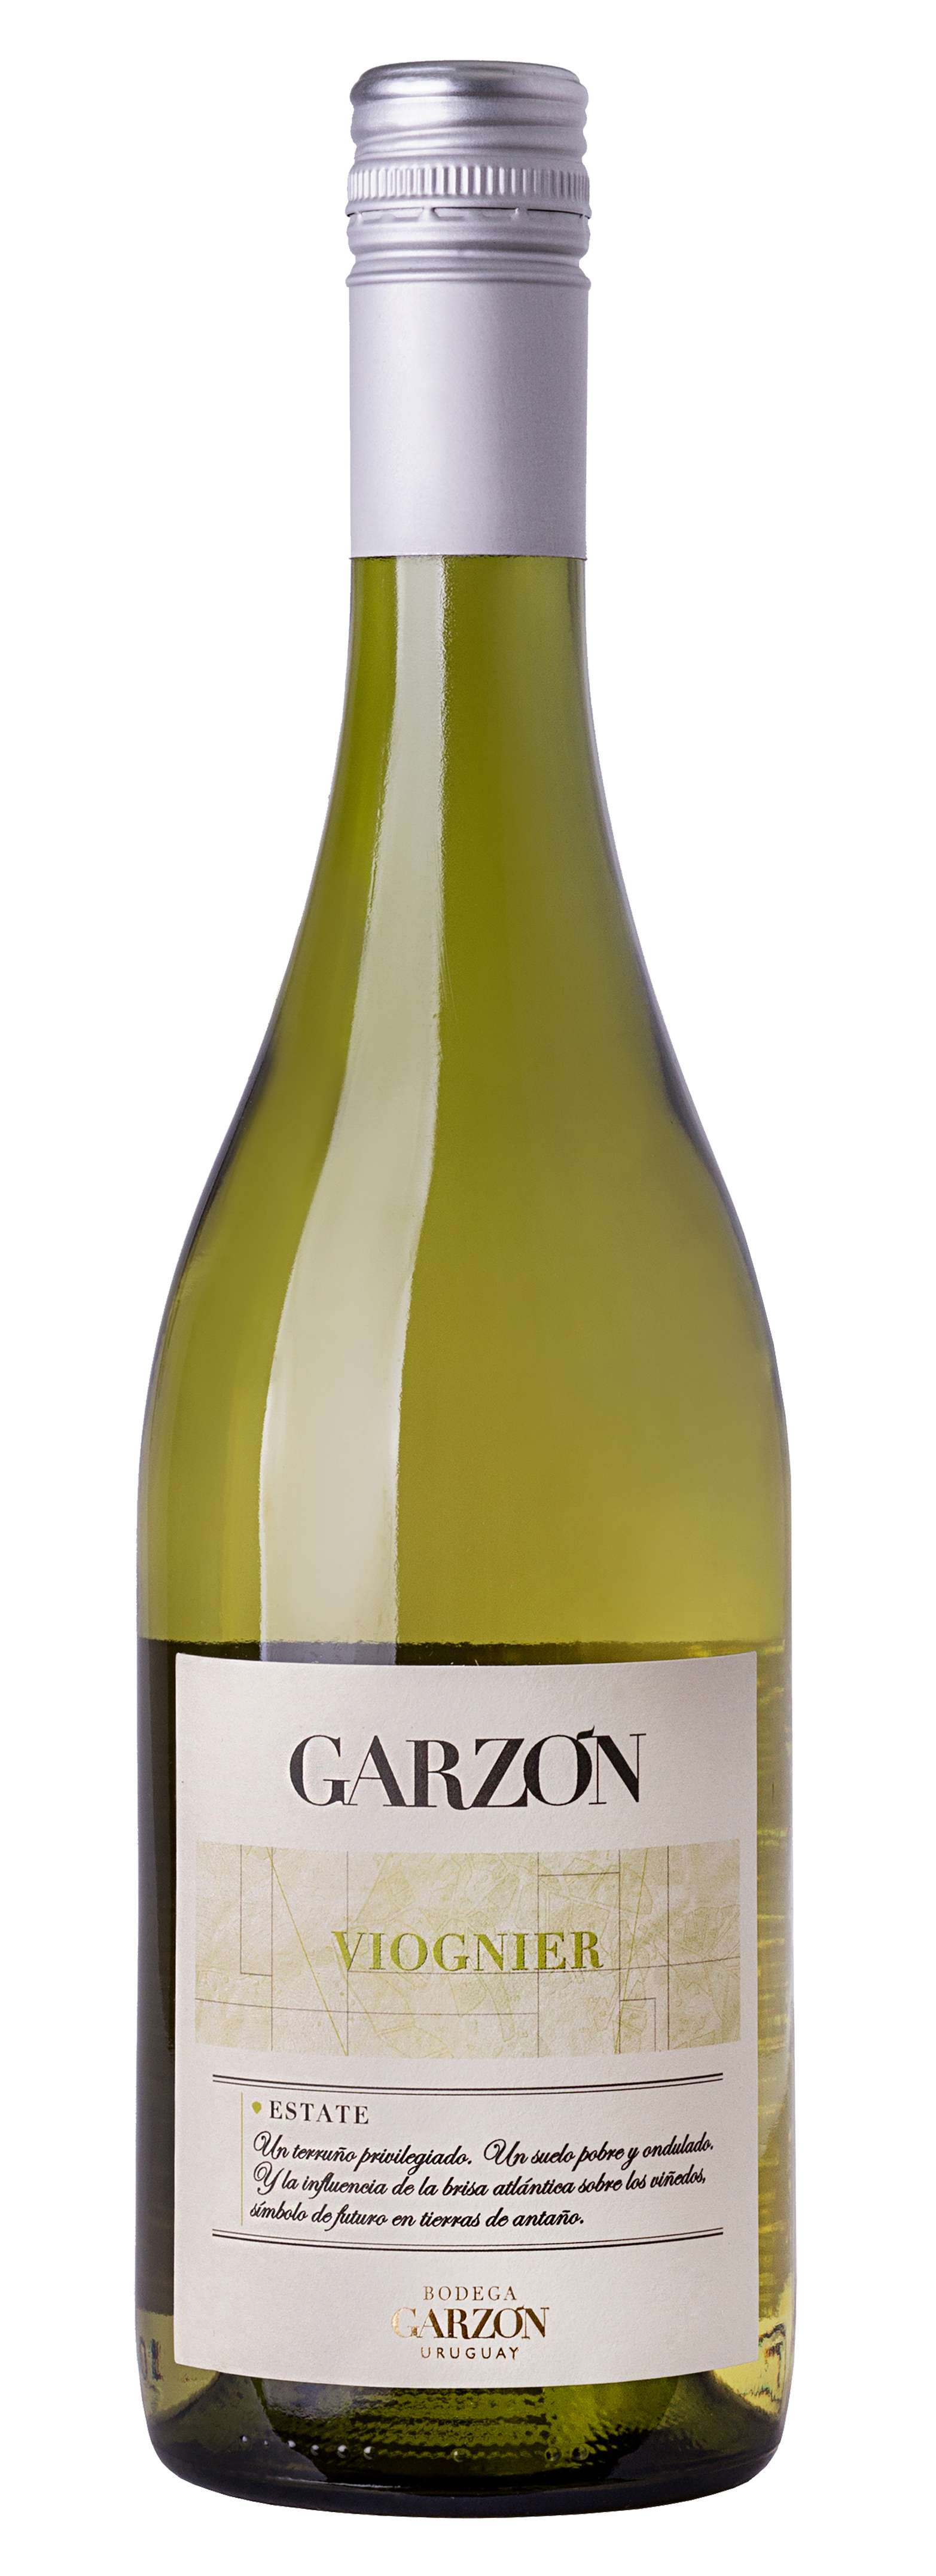 Bodega Garzon Estate Viognier Wines